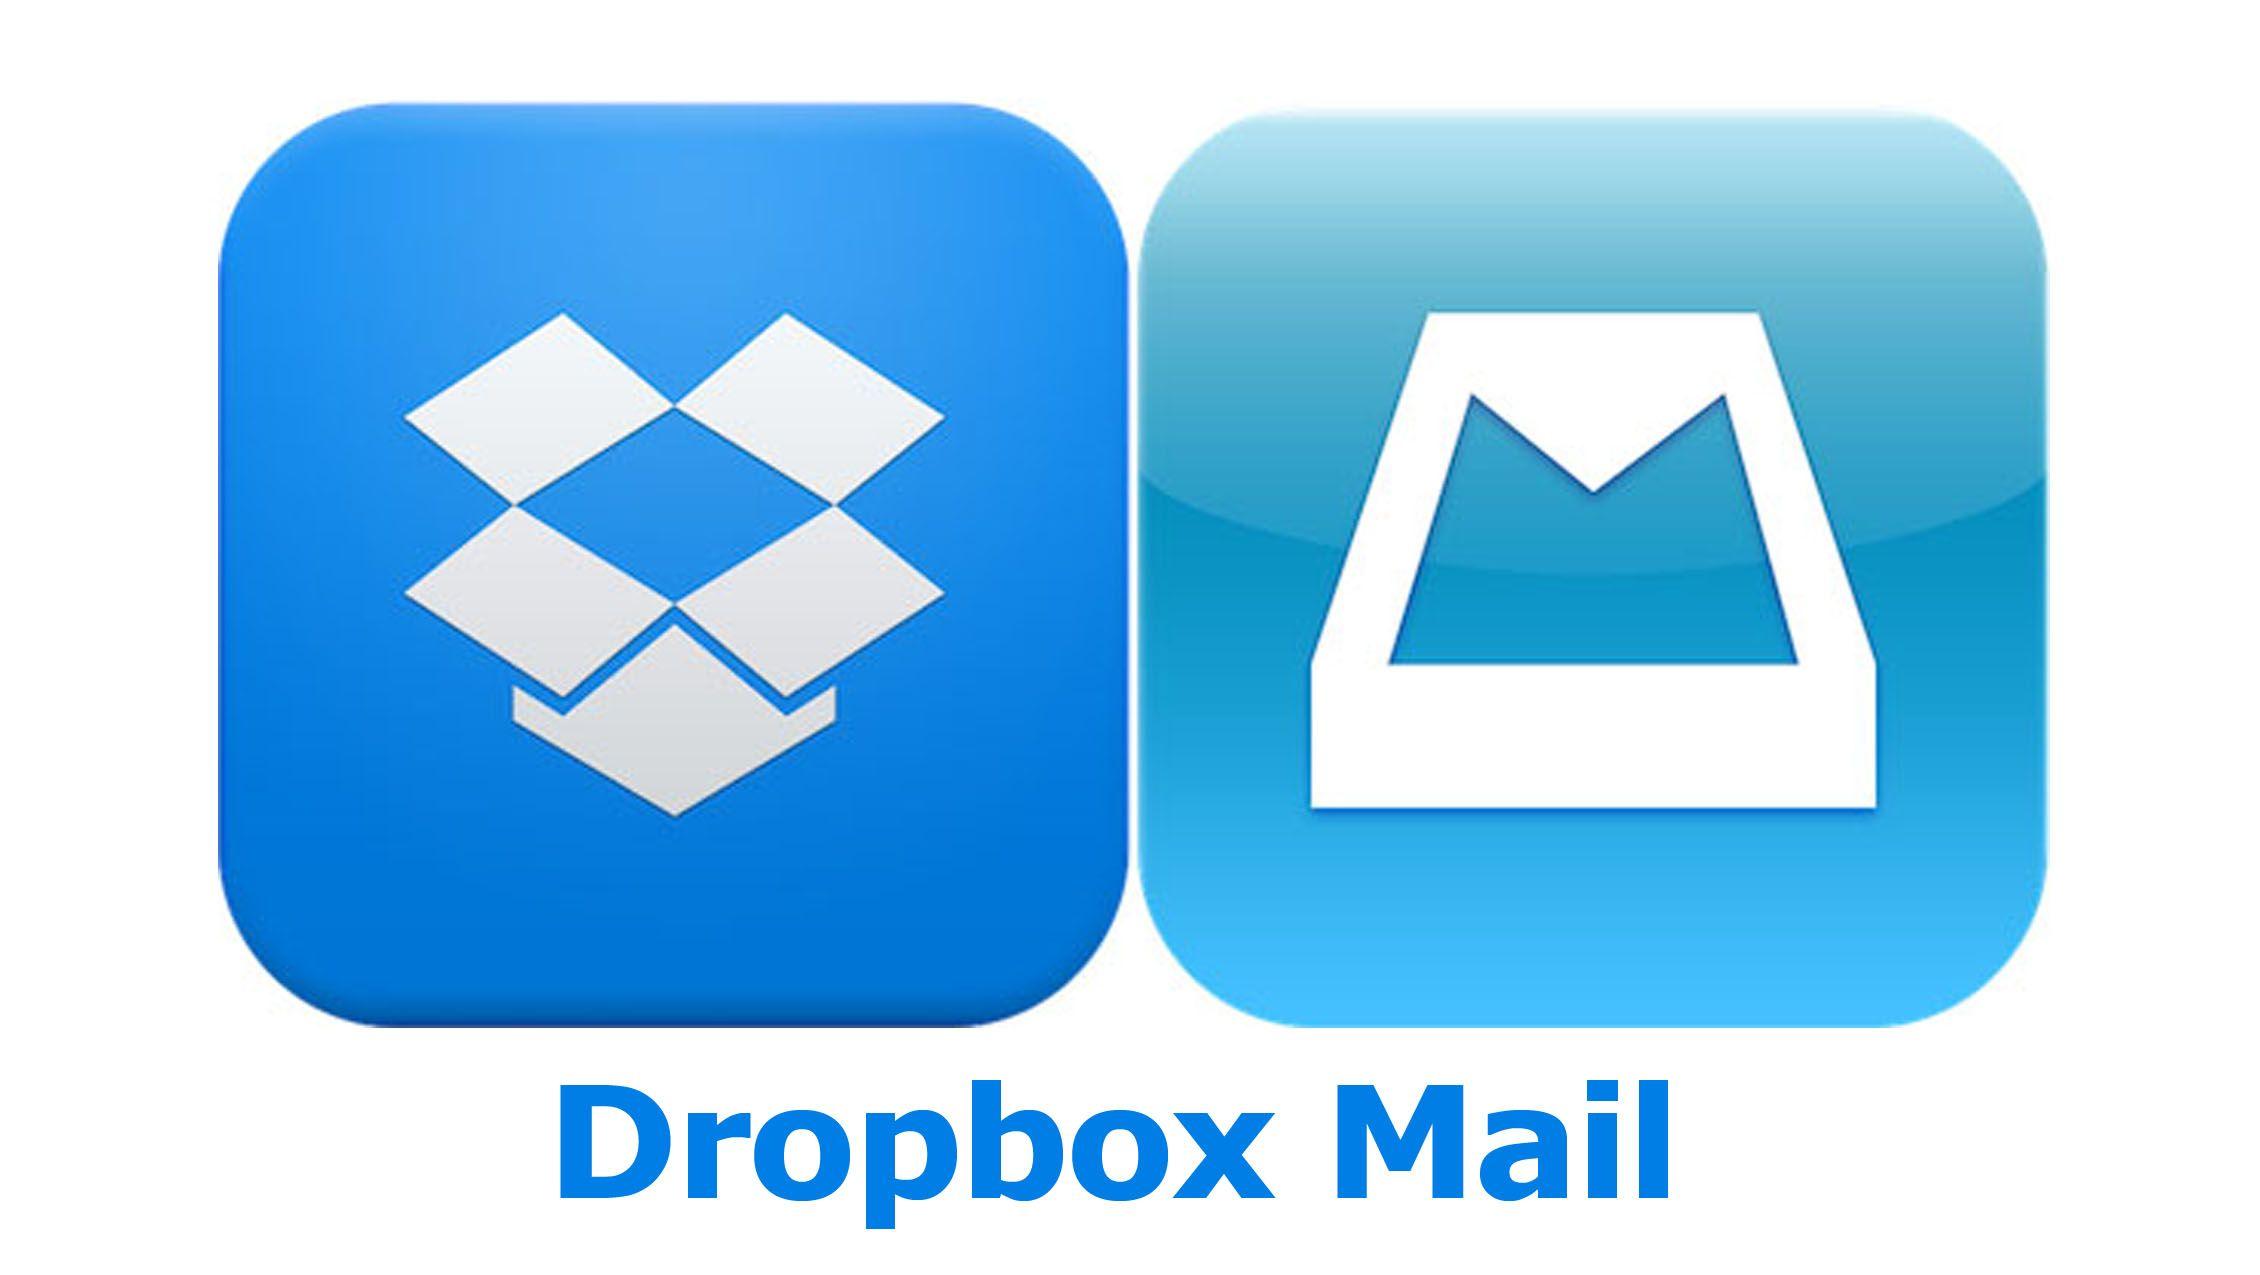 Dropbox Mail Mail Drop Box Near Me Makeover Arena Mail Drop Box Dropbox Mailing